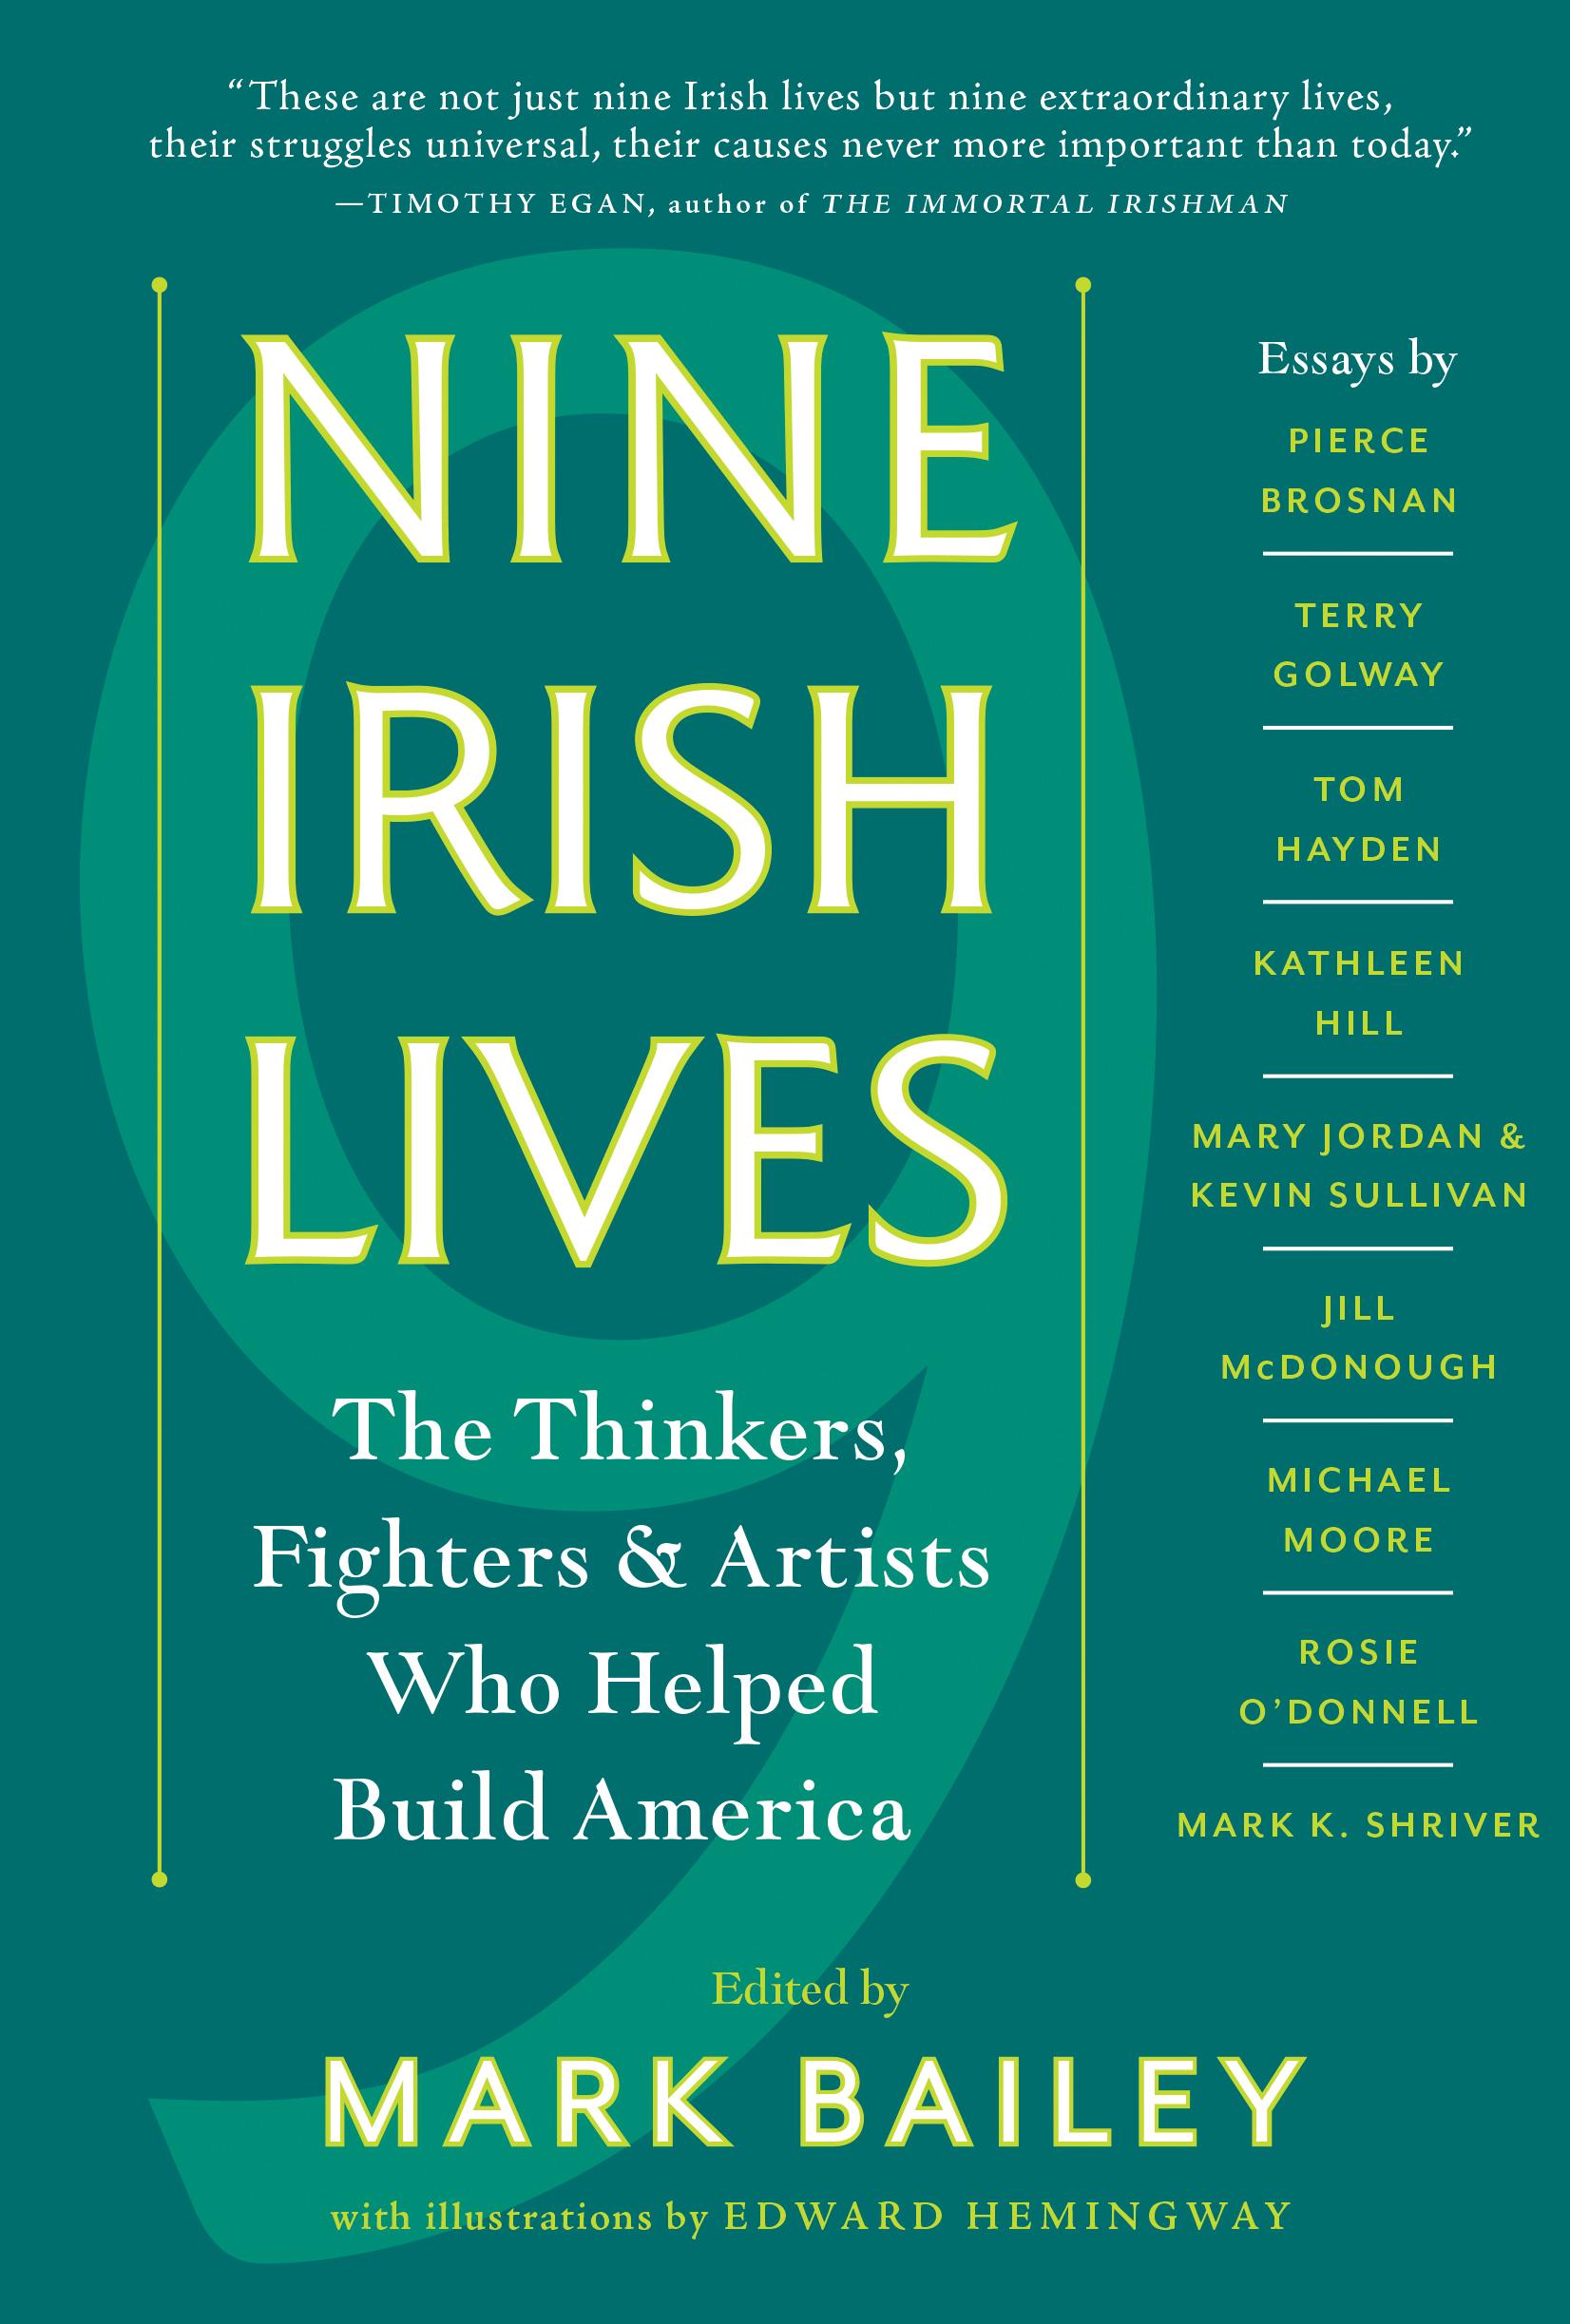 Nine Irish Lives.jpg